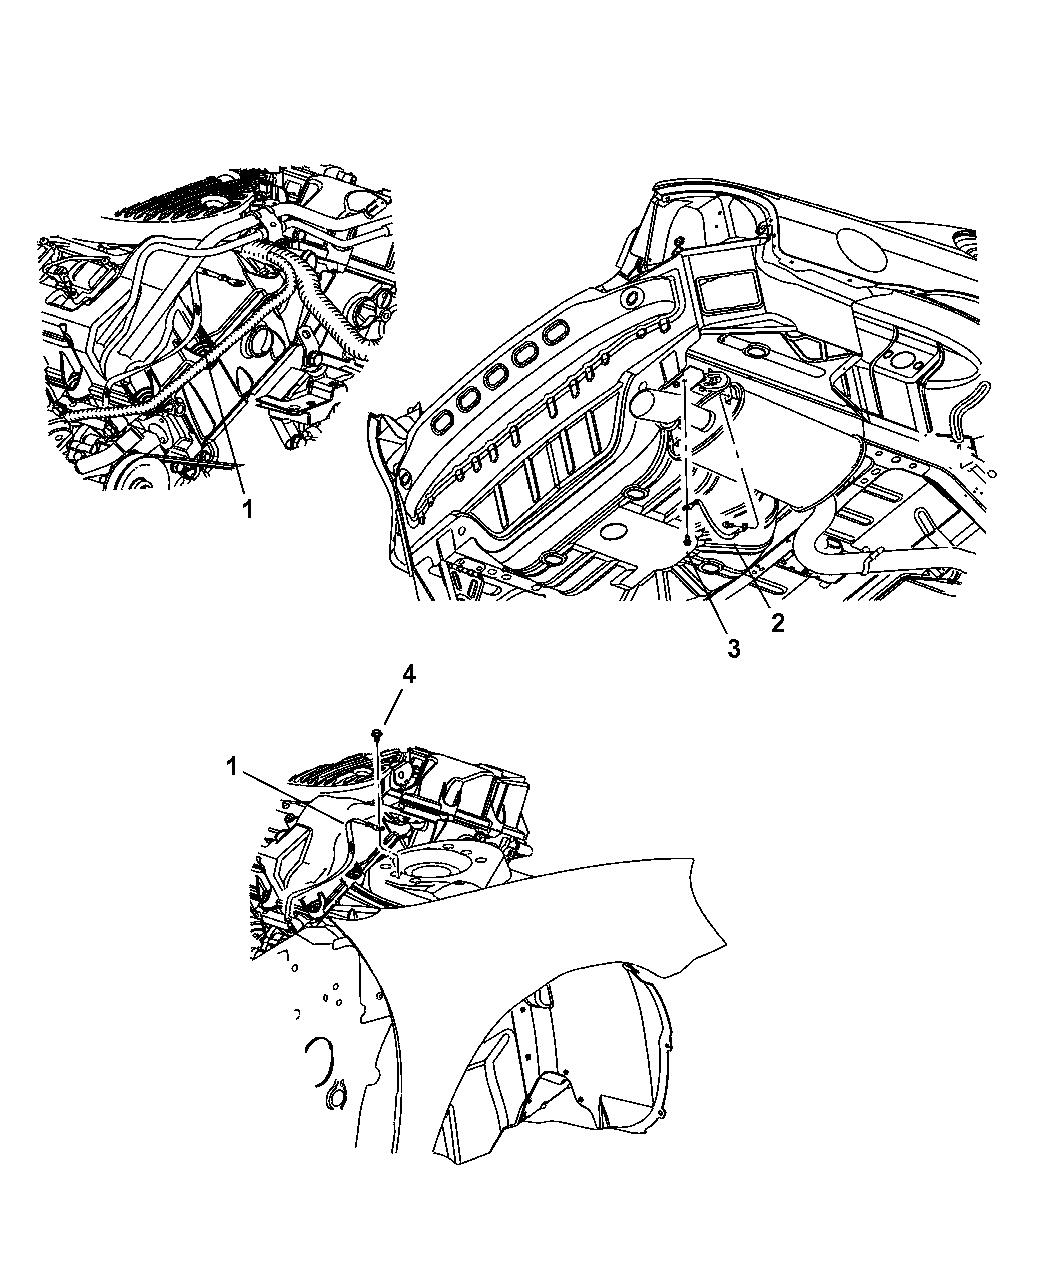 2005 Dodge Stratus Sedan Ground Straps Engine Mopar Parts Giant Diagram